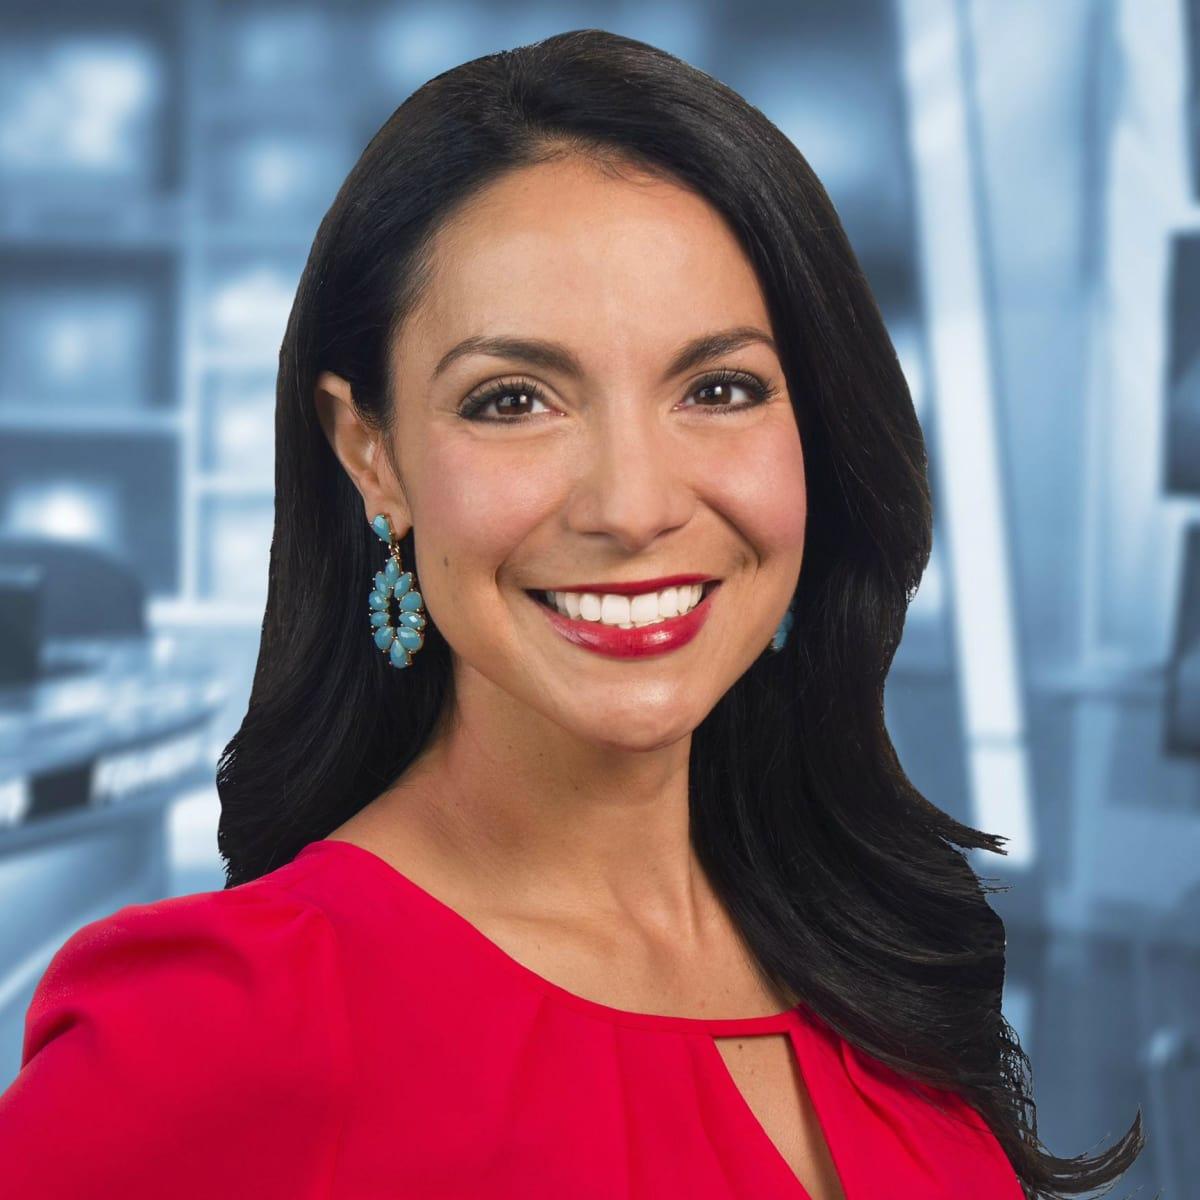 Natalie Solis